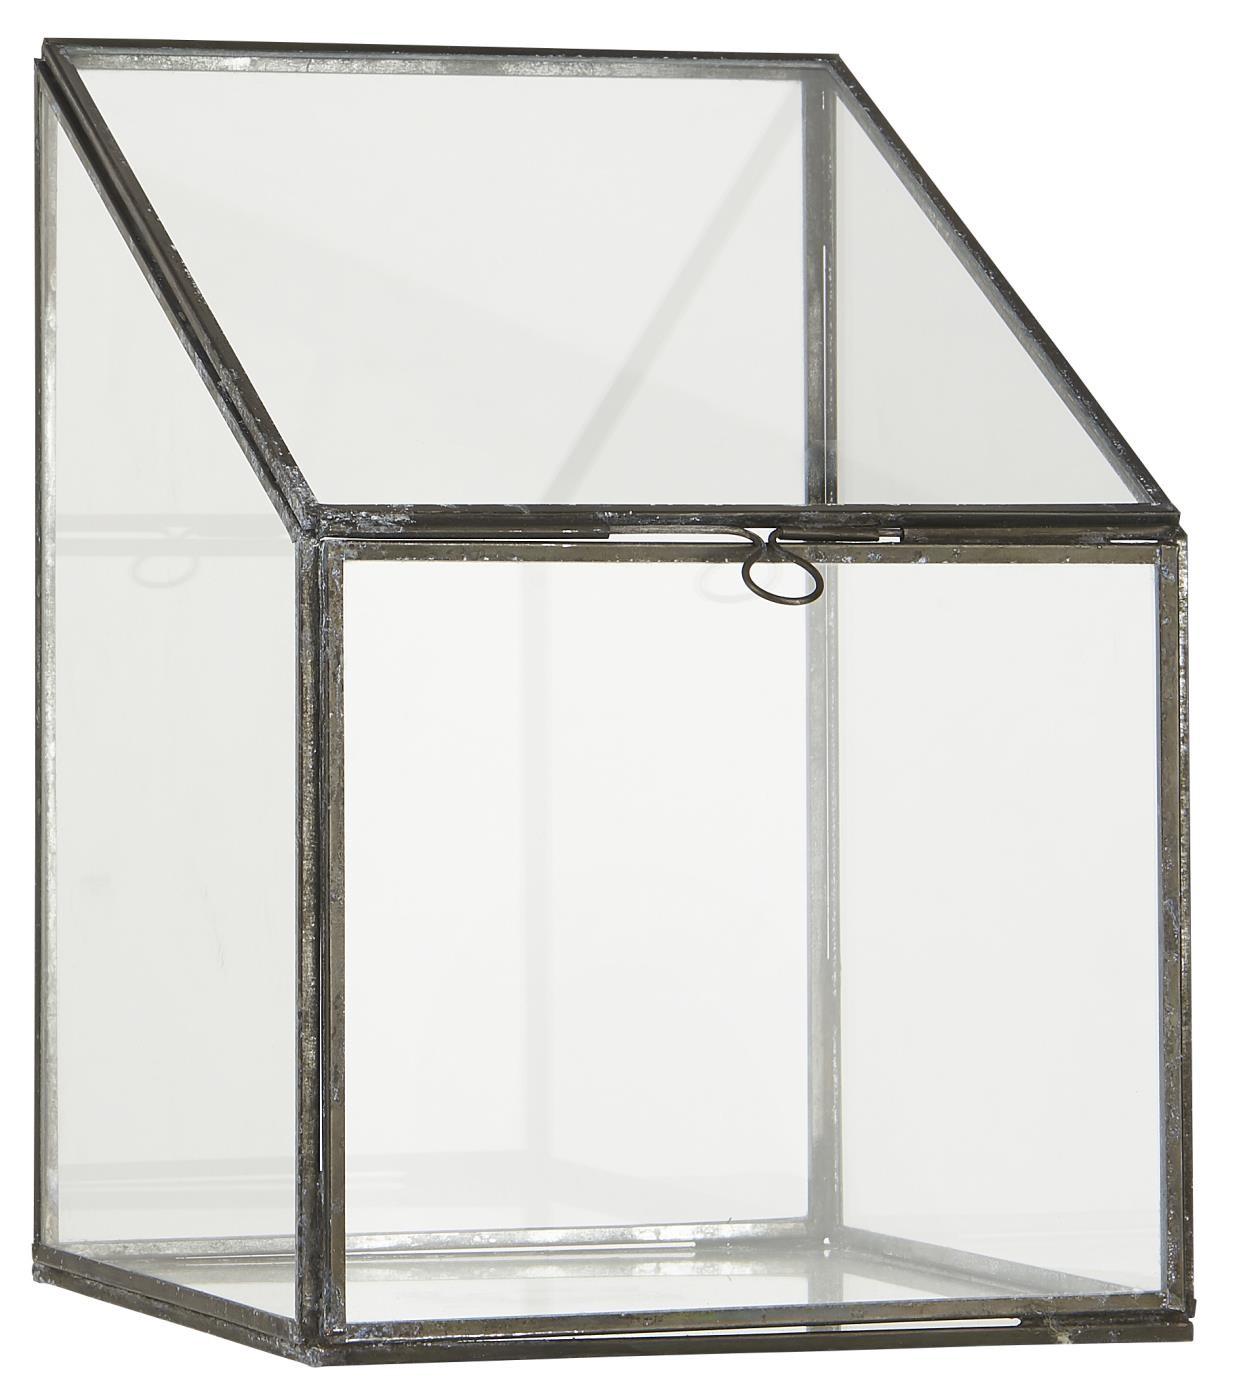 petite serre d interieur verre metal vintage ib laursen kdesign